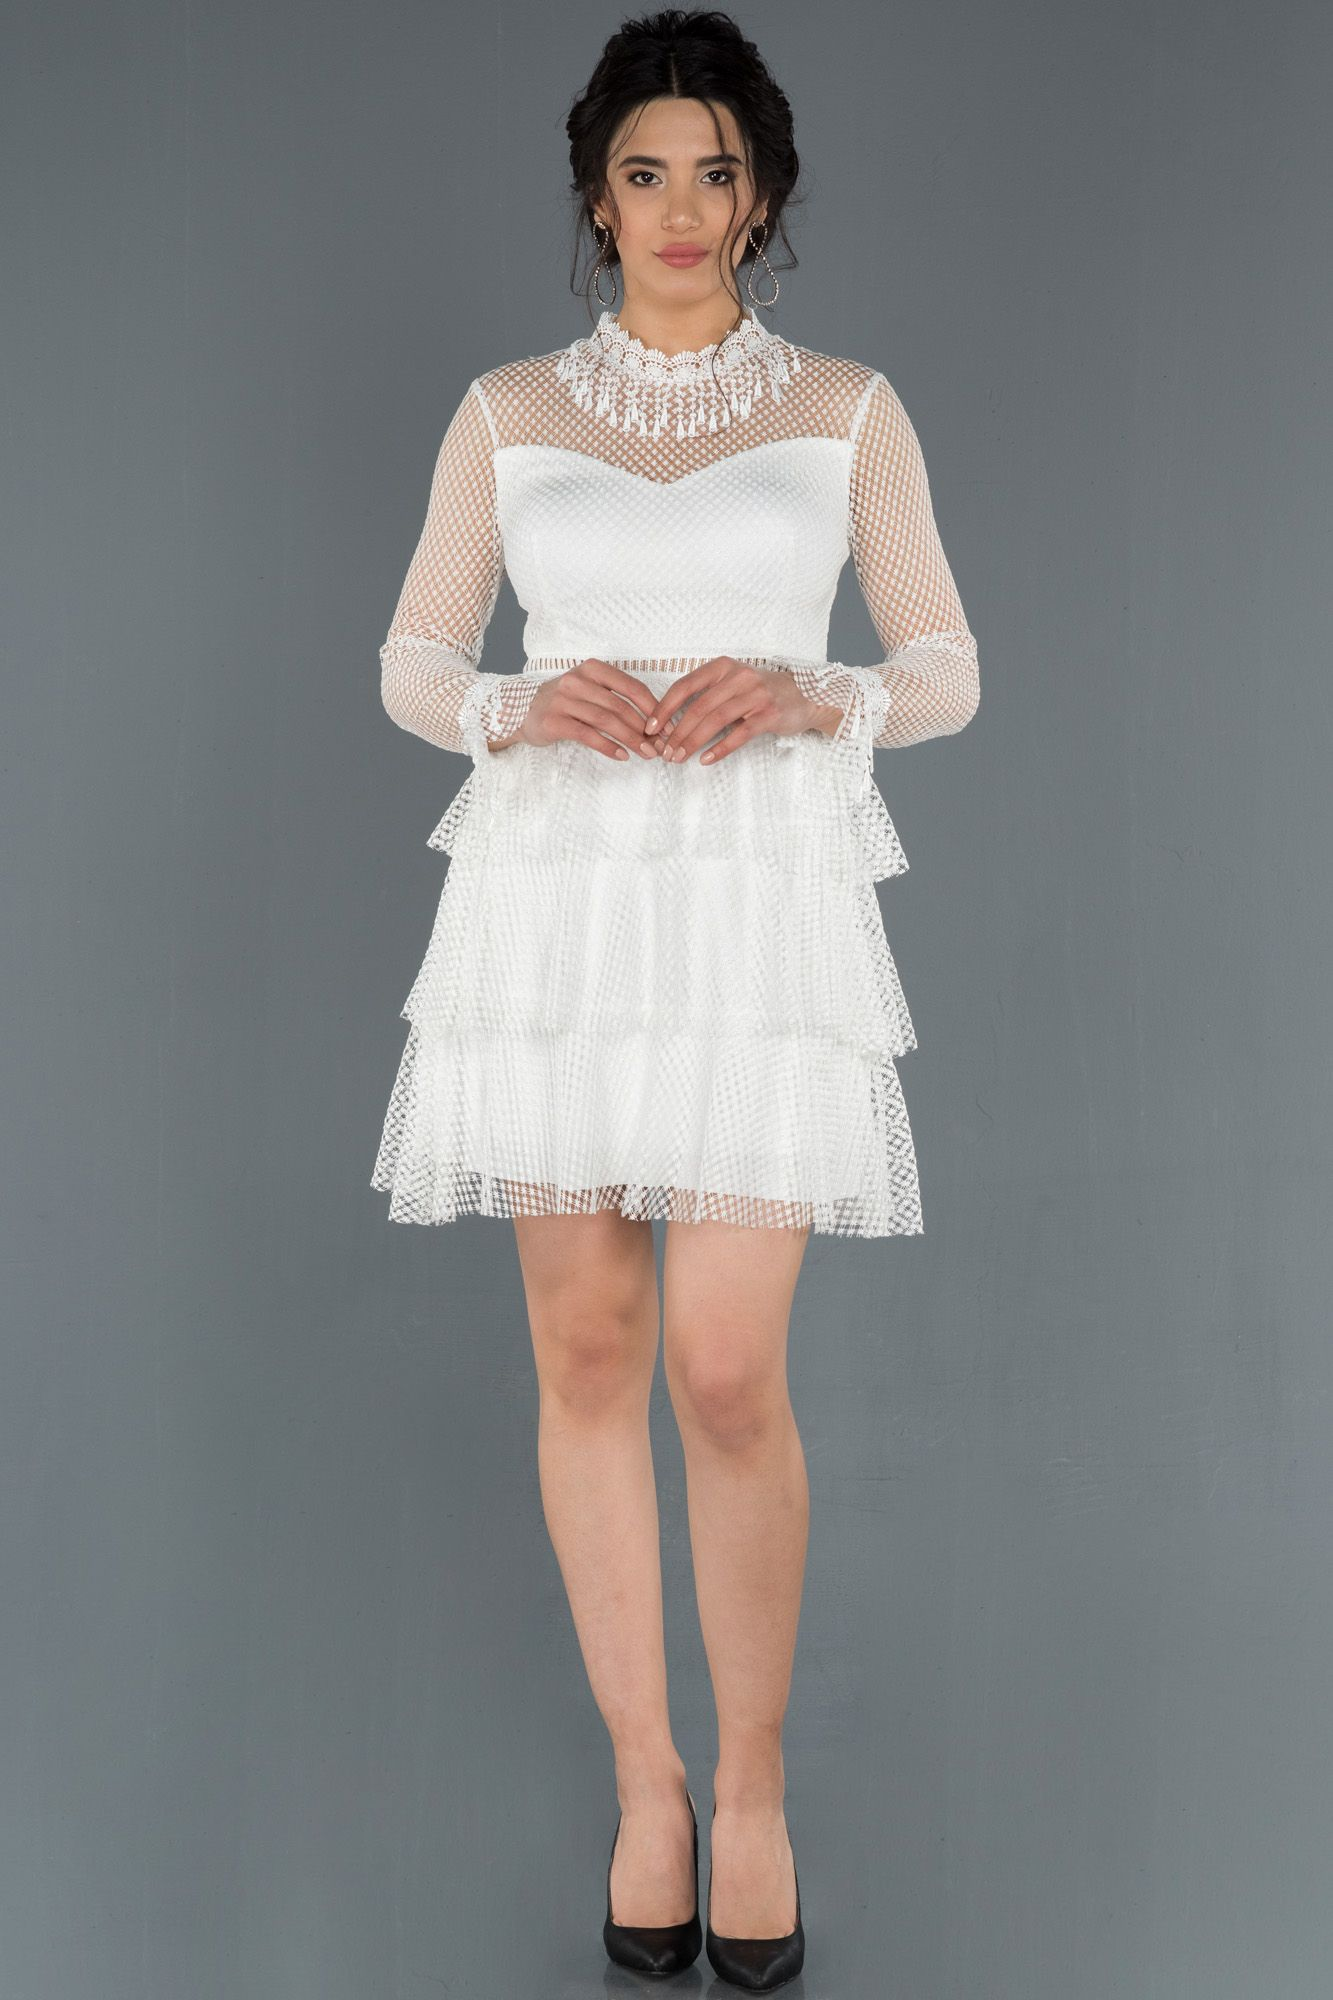 Ekru Kisa Gupurlu Mezuniyet Elbisesi Abk626 2020 The Dress Elbise Moda Stilleri